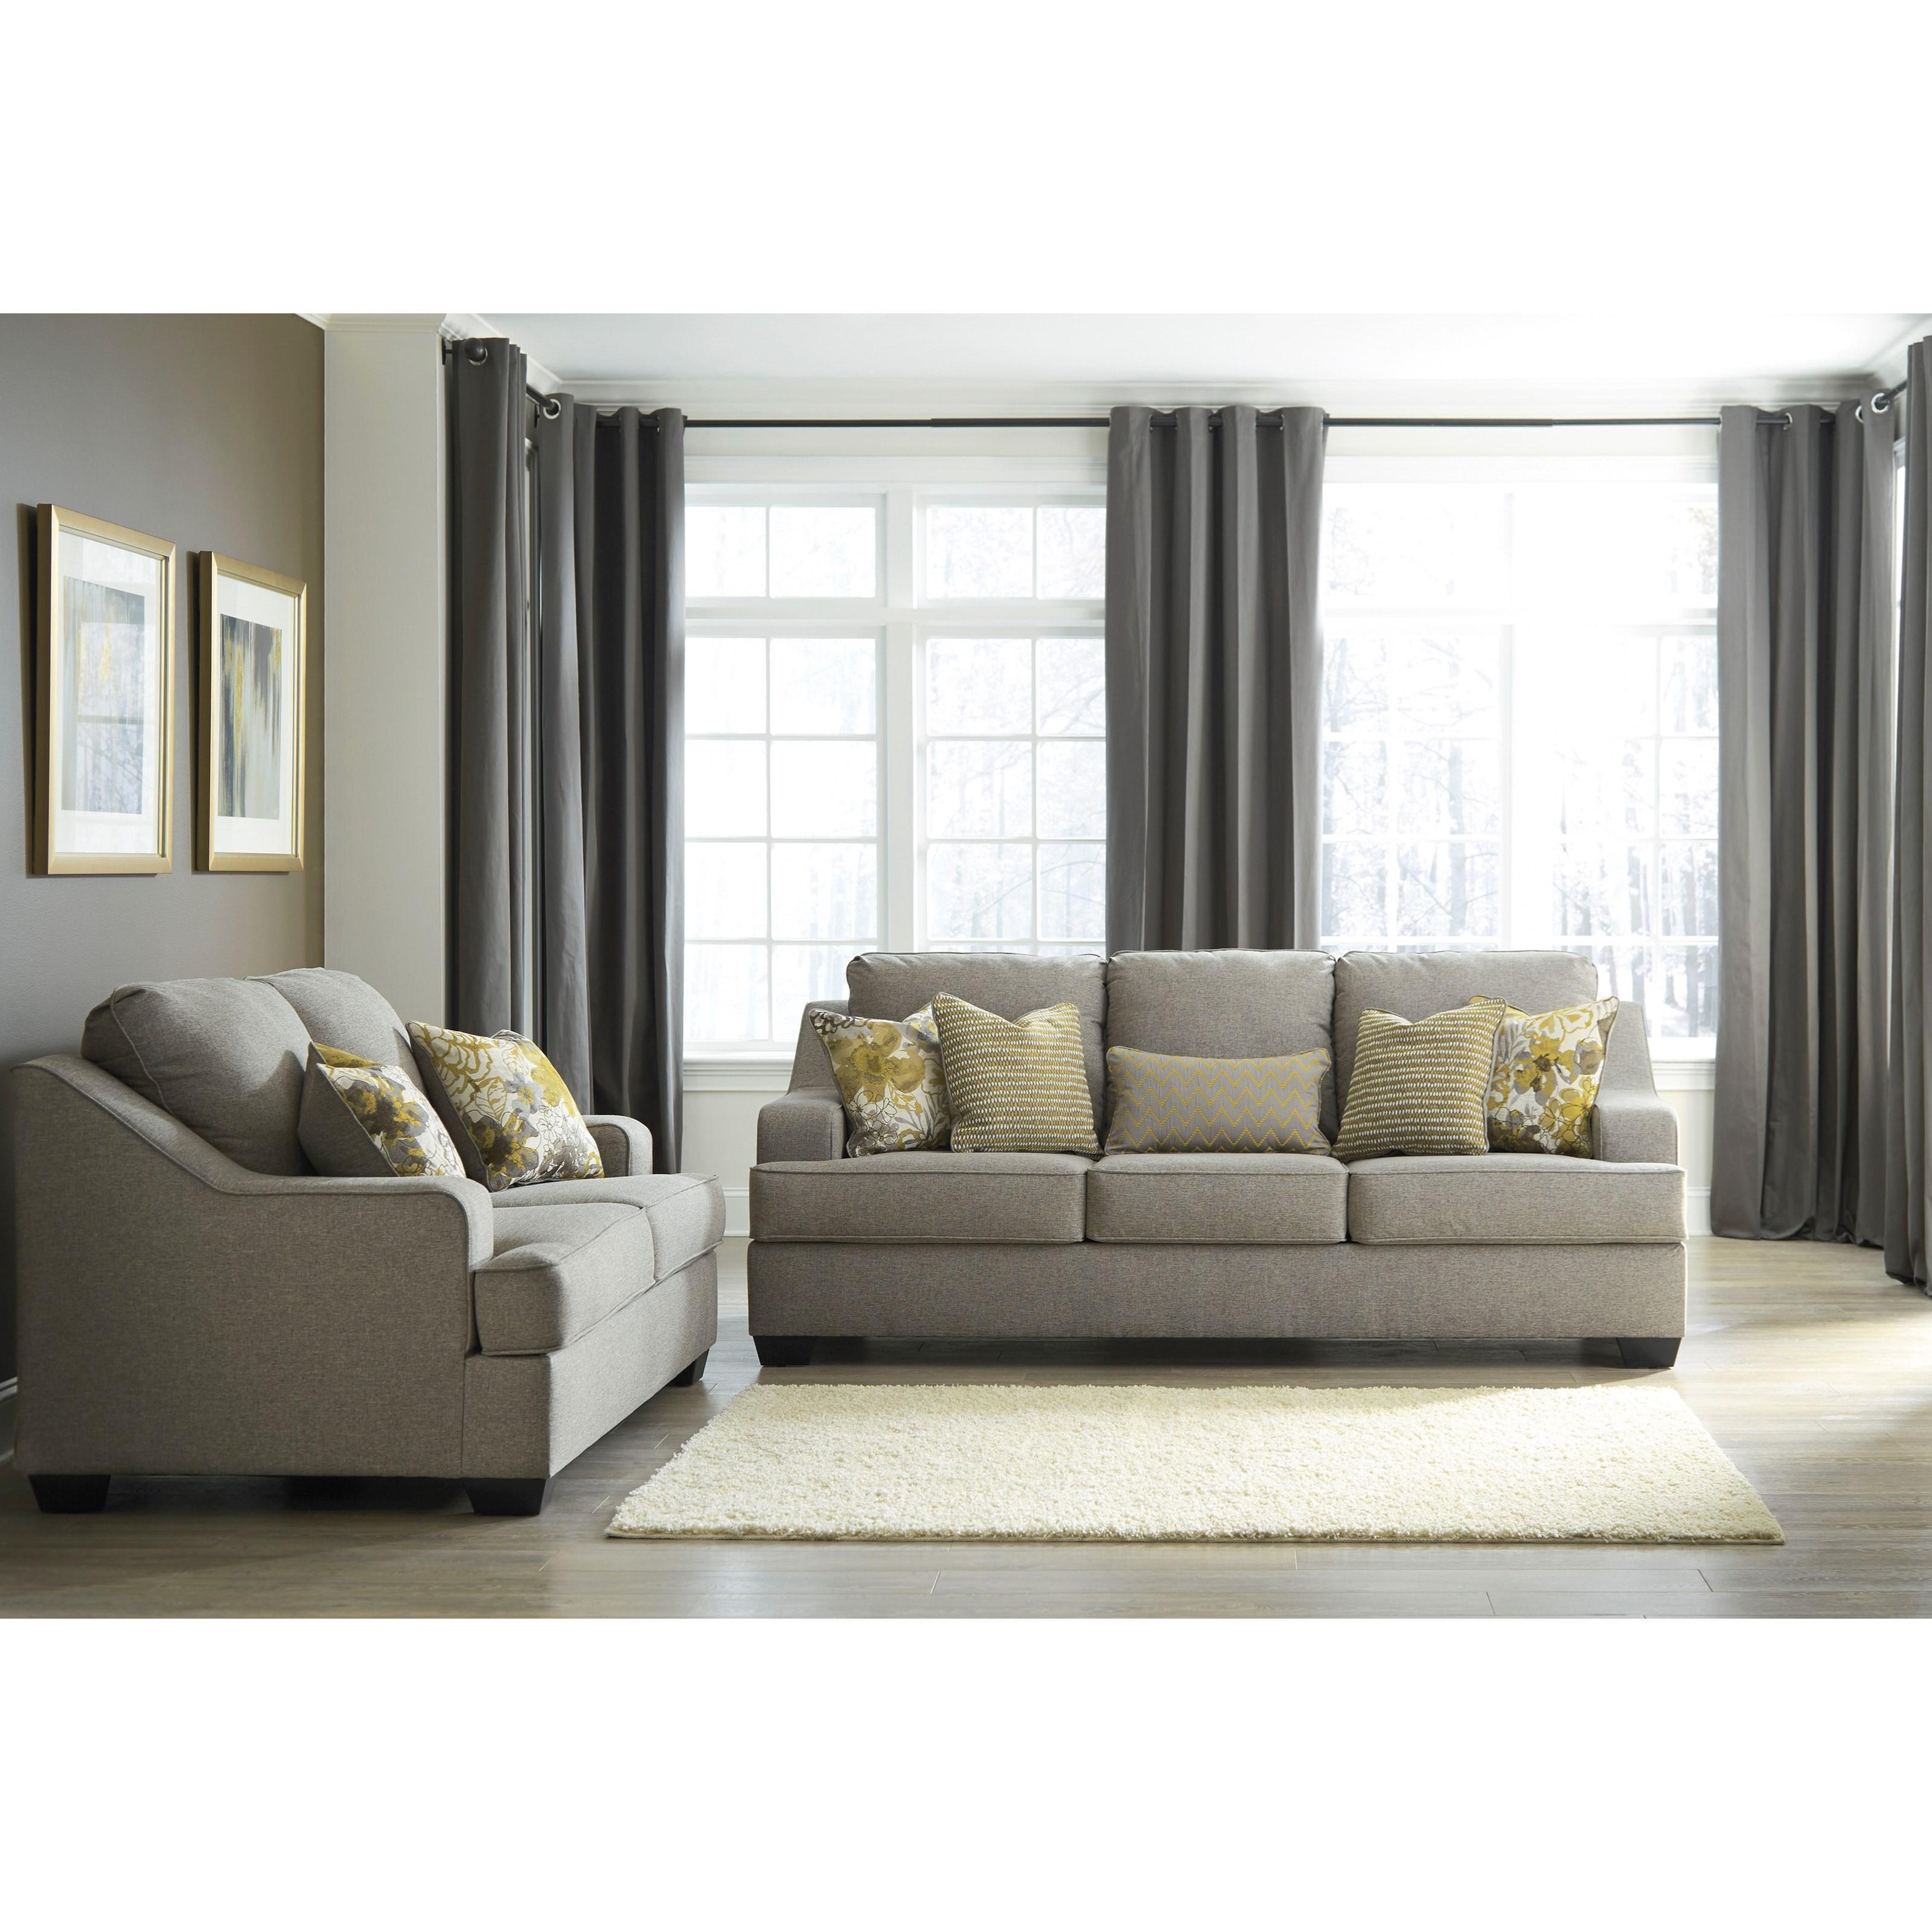 JB King Mandee 93404 Living Room Group 1 Stationary Living